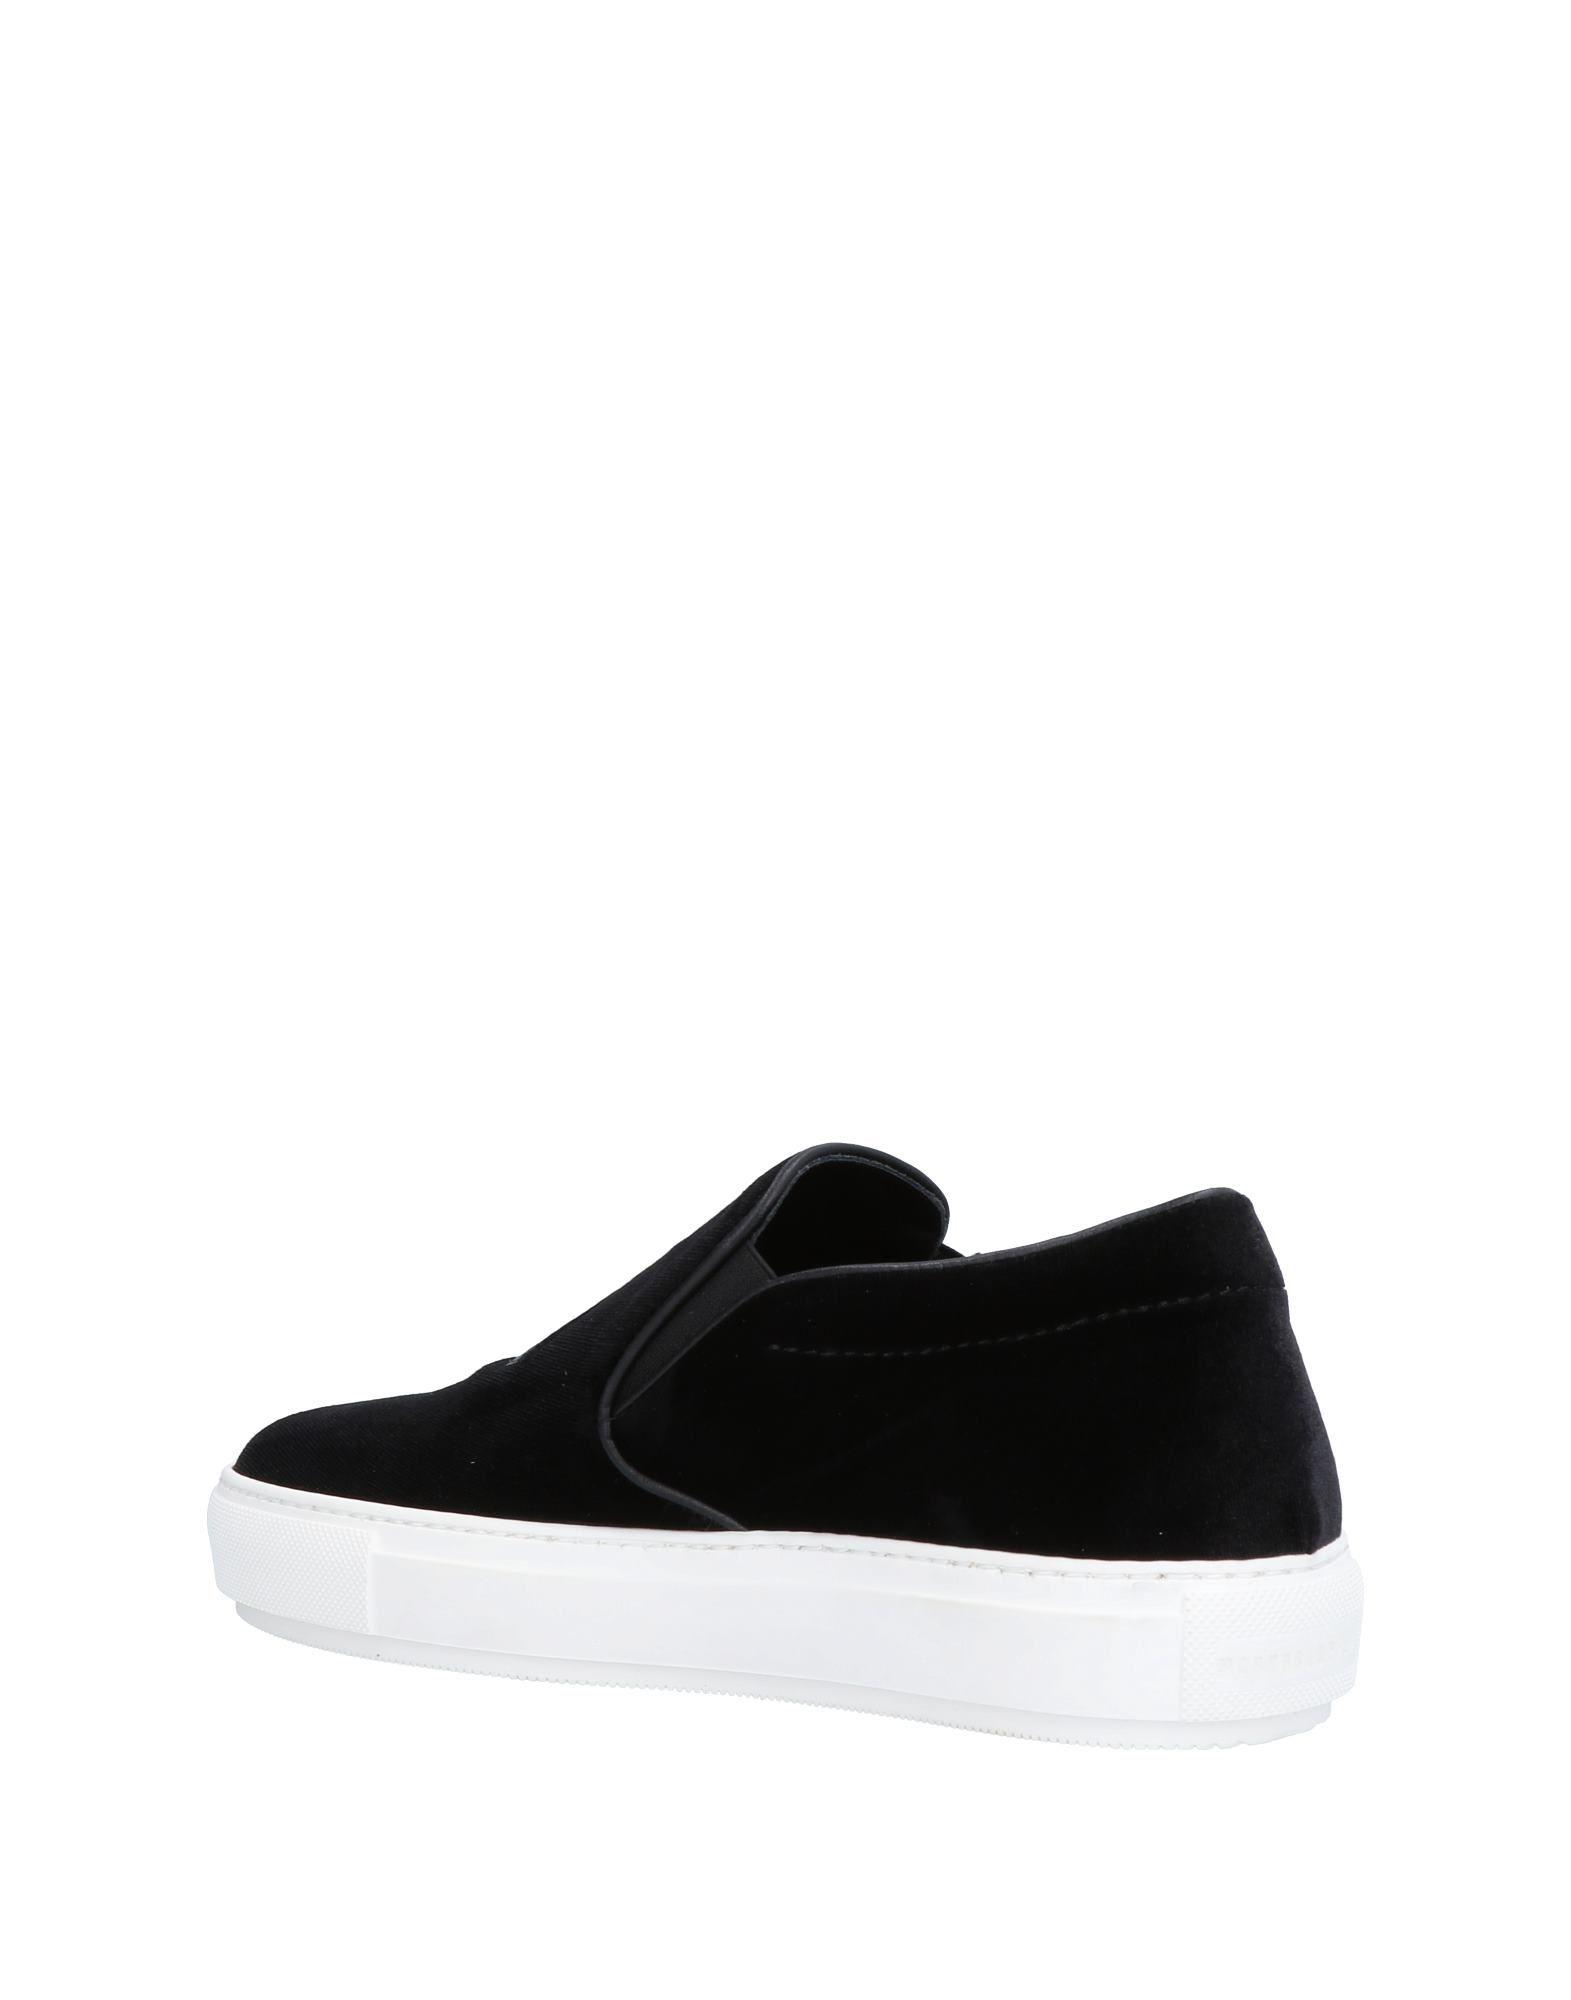 Markus Lupfer Sneakers  Damen  Sneakers 11505007TF Gute Qualität beliebte Schuhe 9a09f8